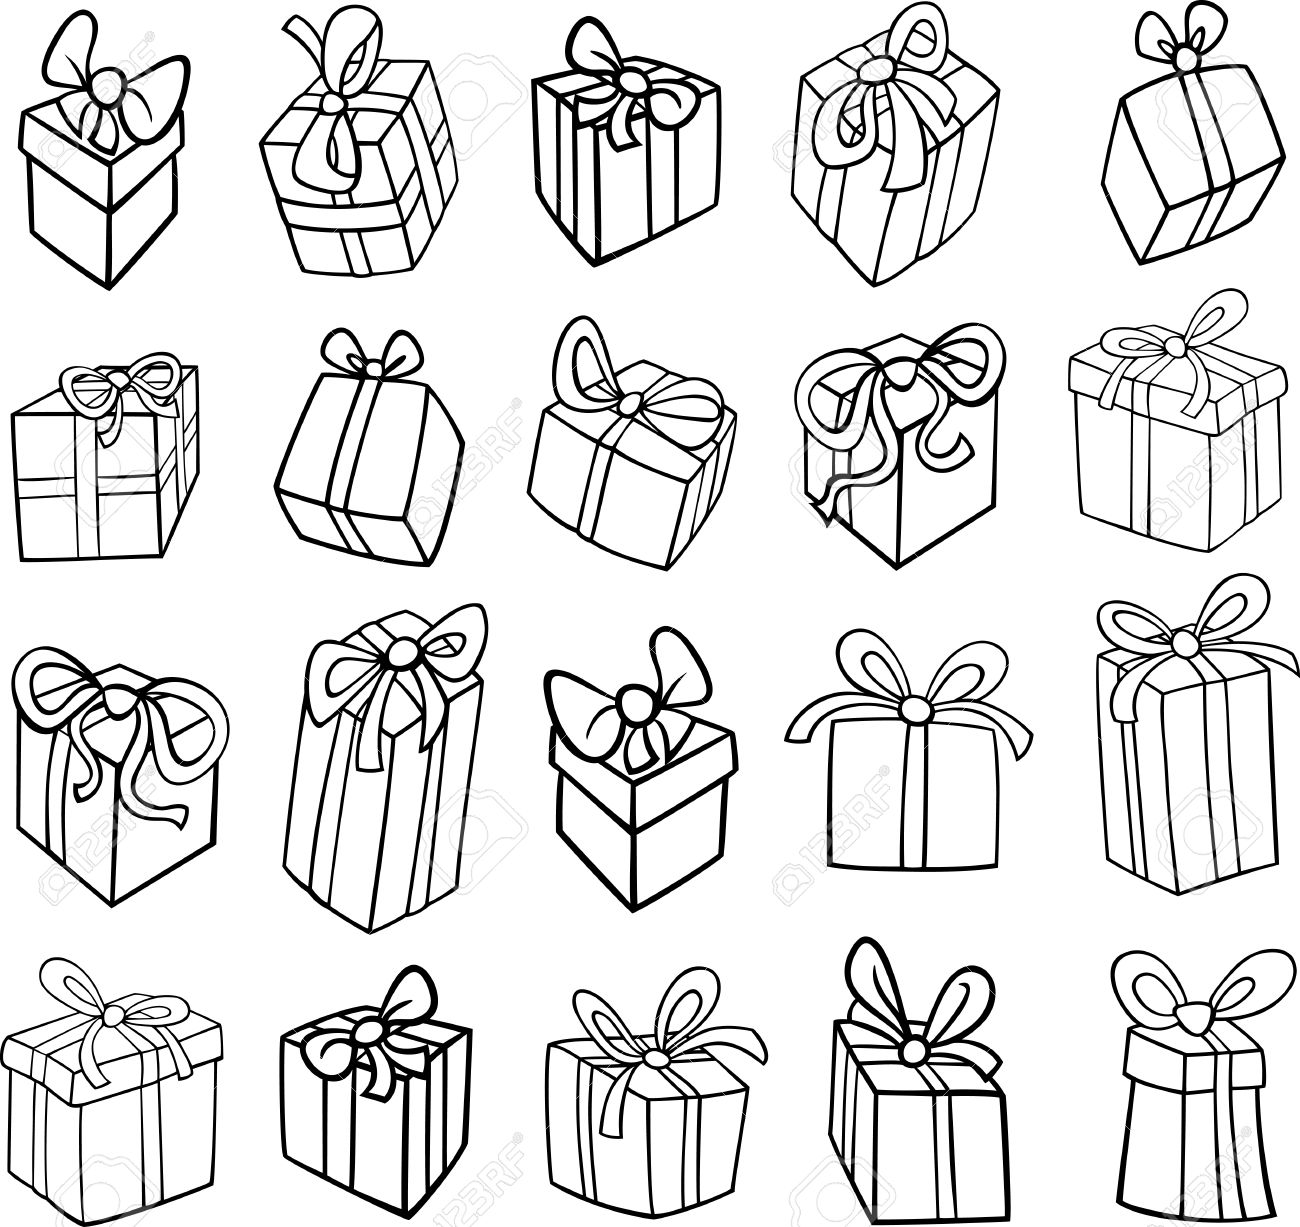 Black and white cartoon illustration of christmas or birthday black and white cartoon illustration of christmas or birthday presents or gifts objects clip art set negle Choice Image